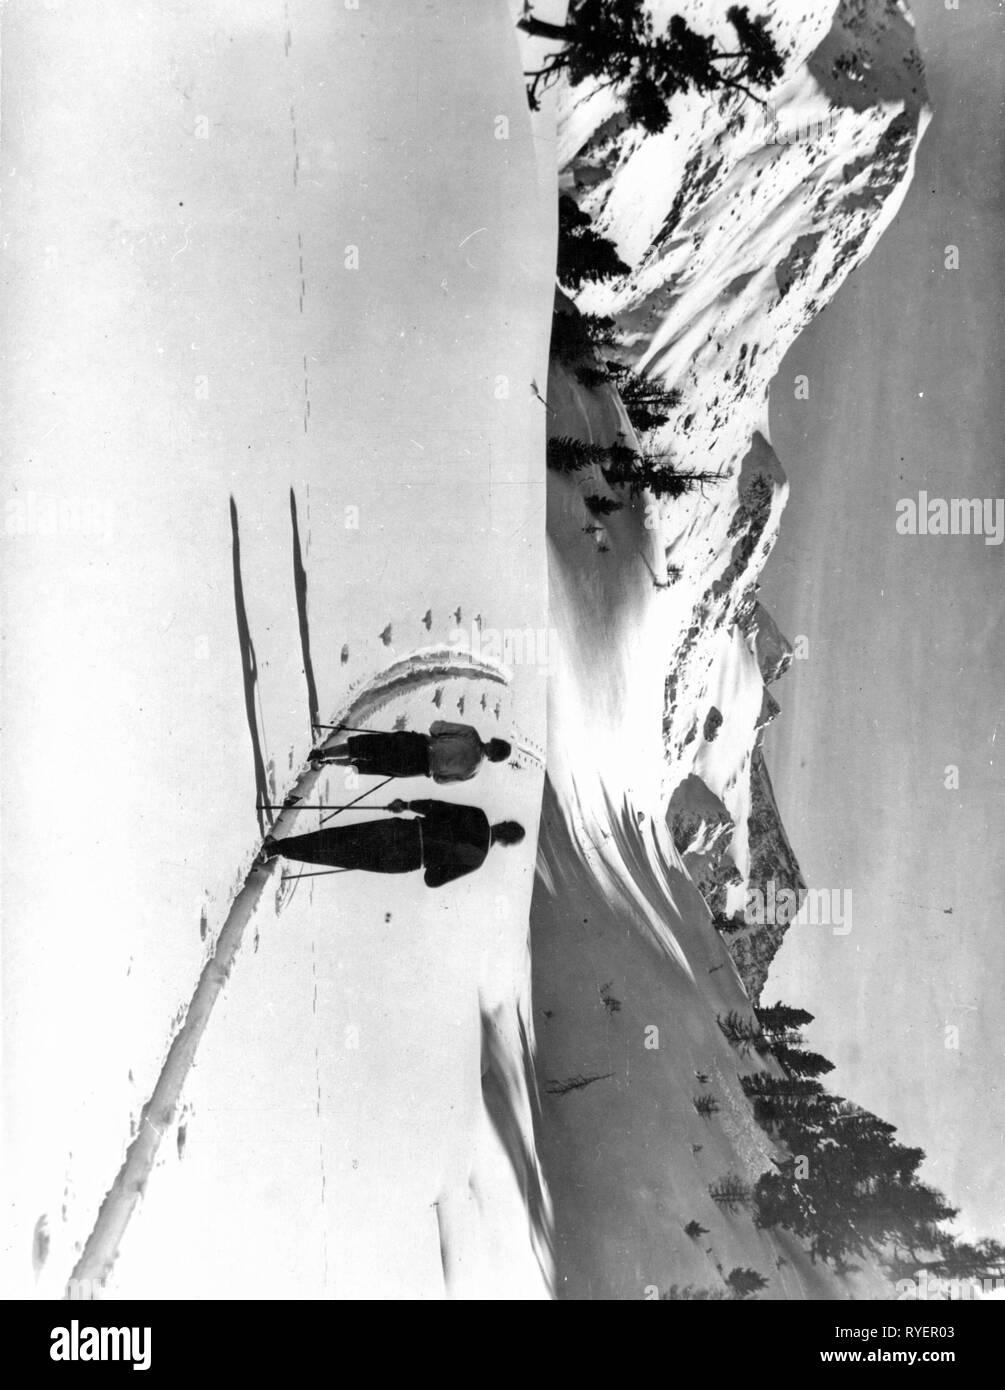 Sports Winter Sports Ski Tour On Piz Rosatsch Near Saint Moritz Switzerland 1920s Additional Rights Clearance Info Not Available Stock Photo Alamy